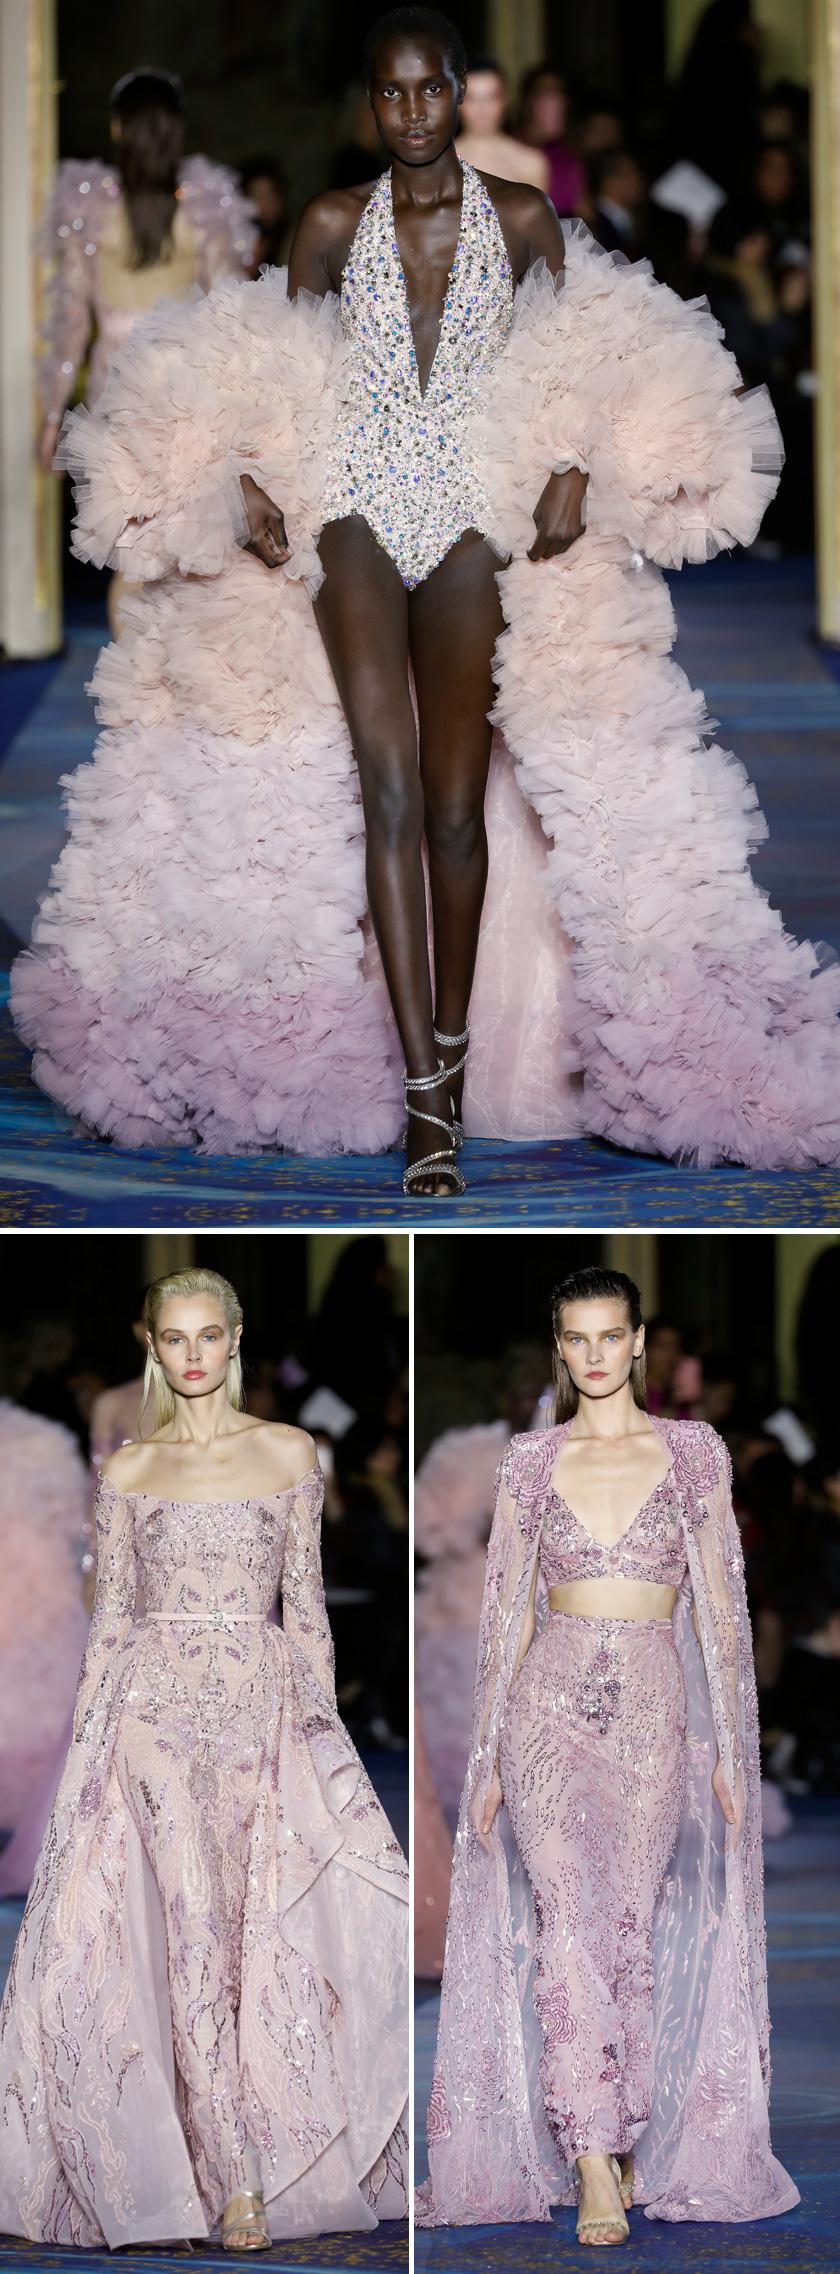 Zuhair Murad, Zuhair Murad Haute Couture, Zuhair Murad Aquatic Serenade, Haute Couture Week, Paris Fashion Week, Fashion, Zuhair Murad dress, Couture Bride, Perfect Wedding Magazine, Perfect Wedding Blog